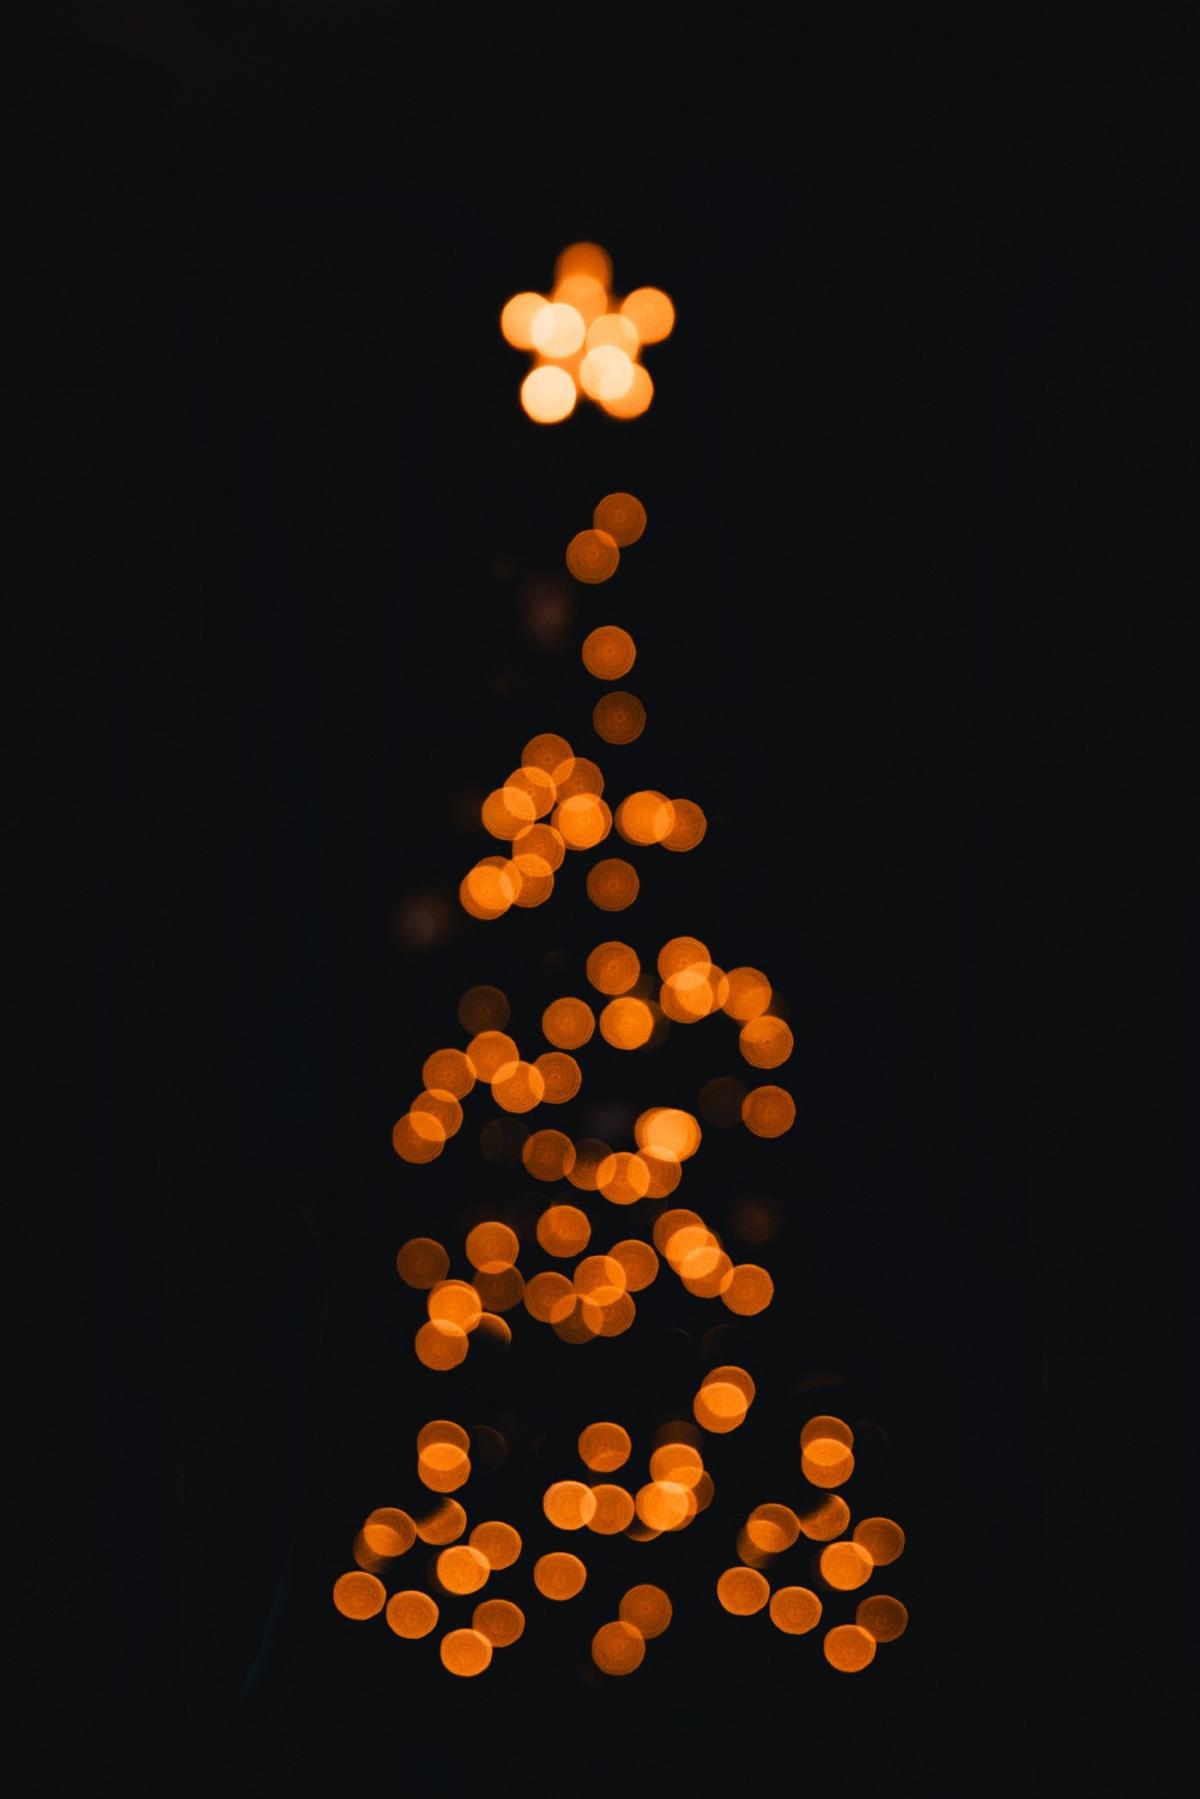 Manifesto-Market-MR-Brut-Christmas-Tree-1.jpg